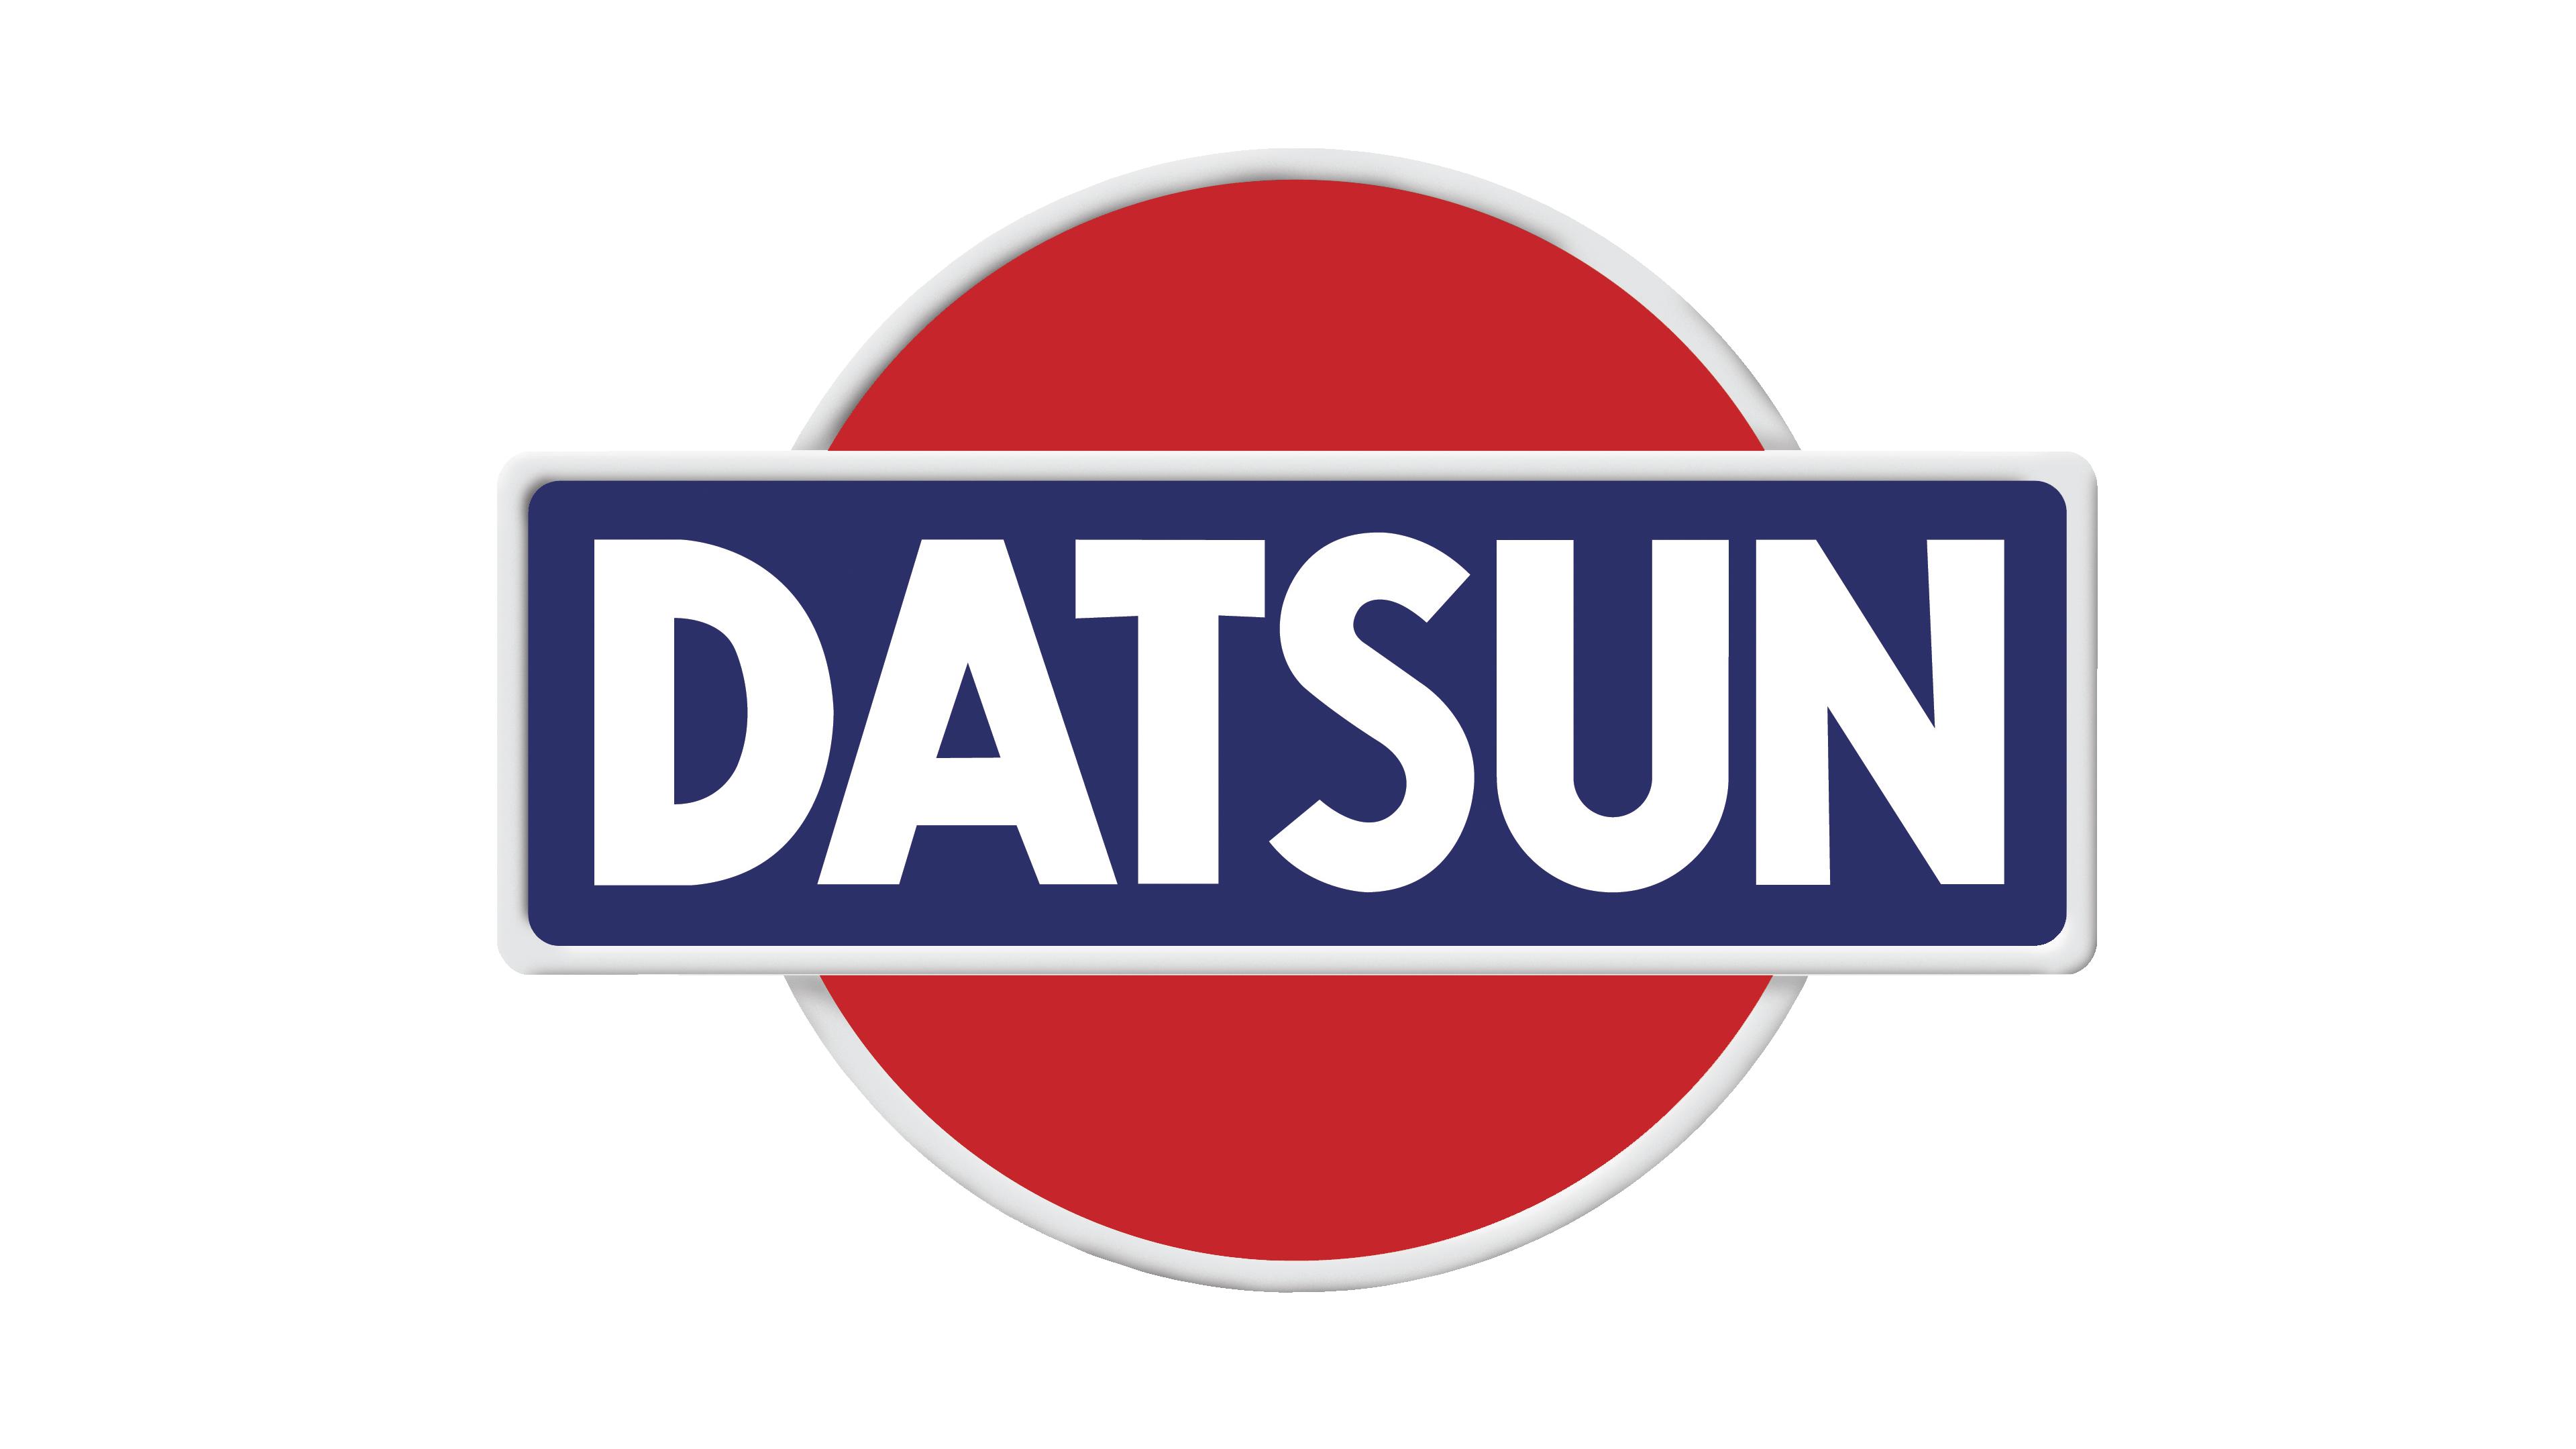 nissan logo transparent background. datsun logo 1935 3840x2160 hd png nissan transparent background